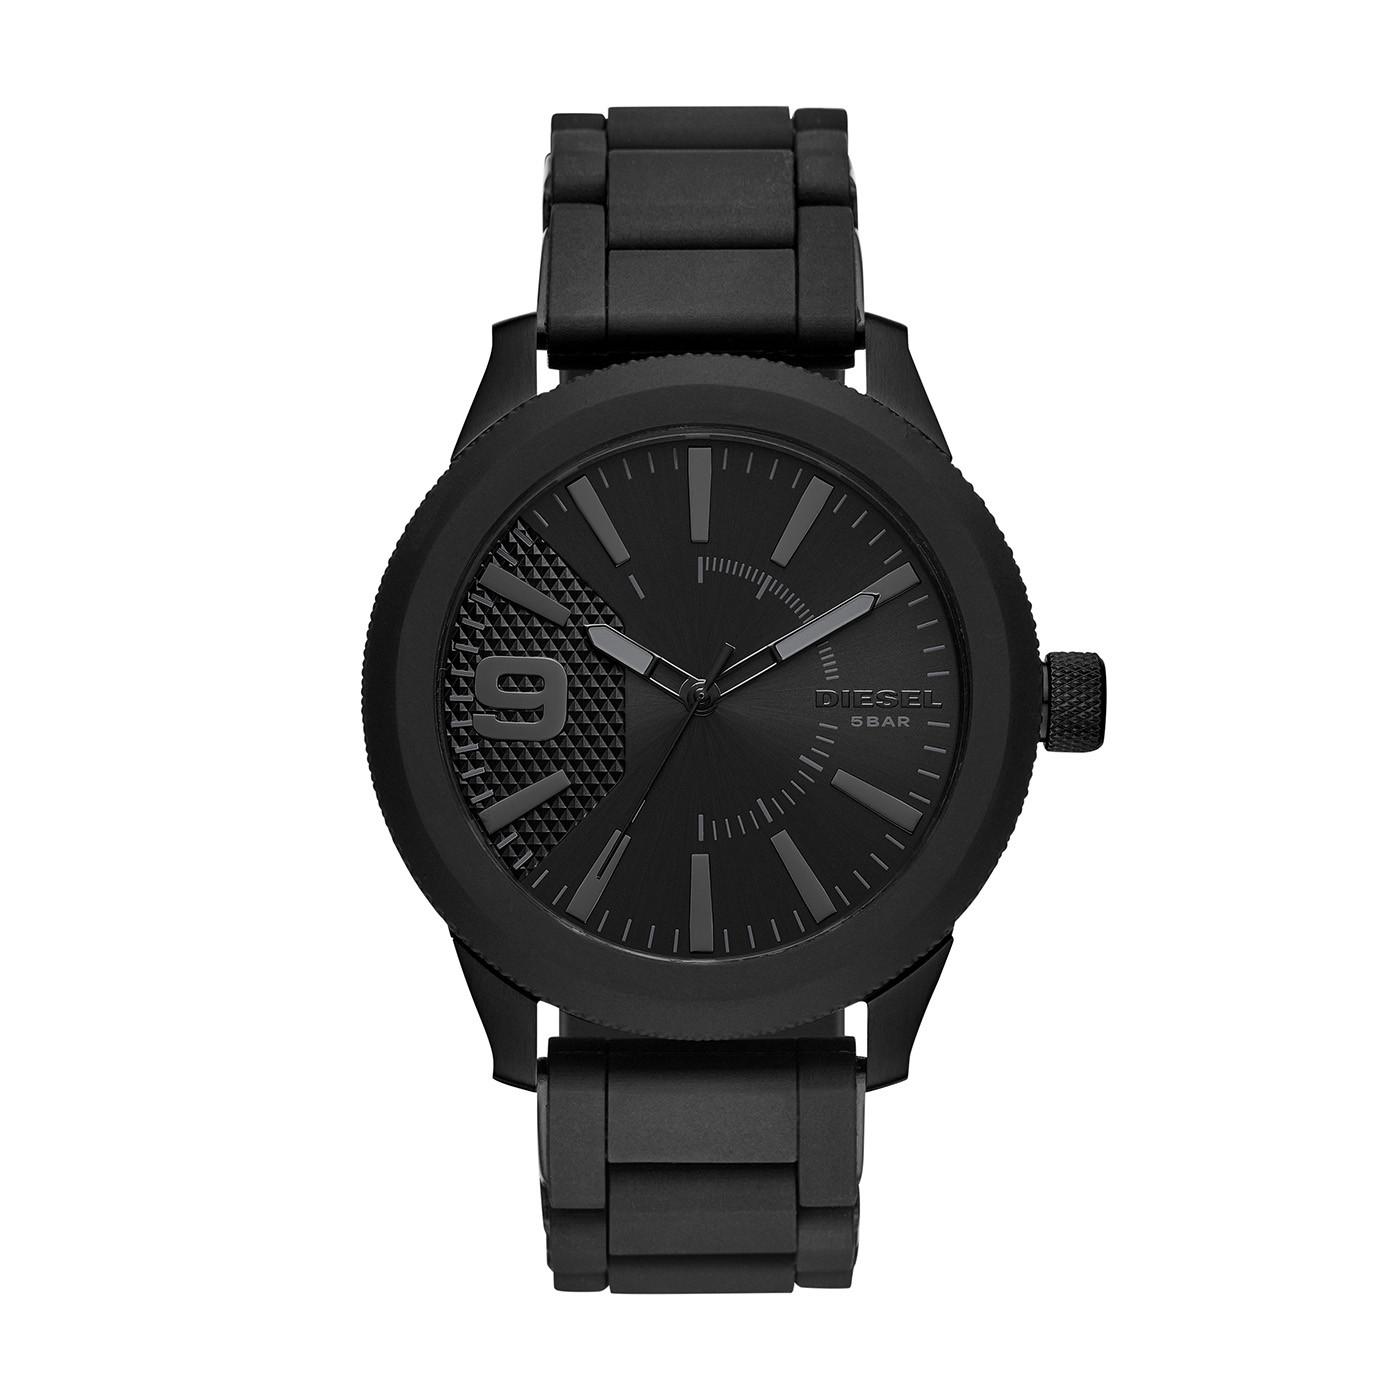 0cc7357e6c15 Diesel Rasp Nsbb horloge DZ1873 - Relojes